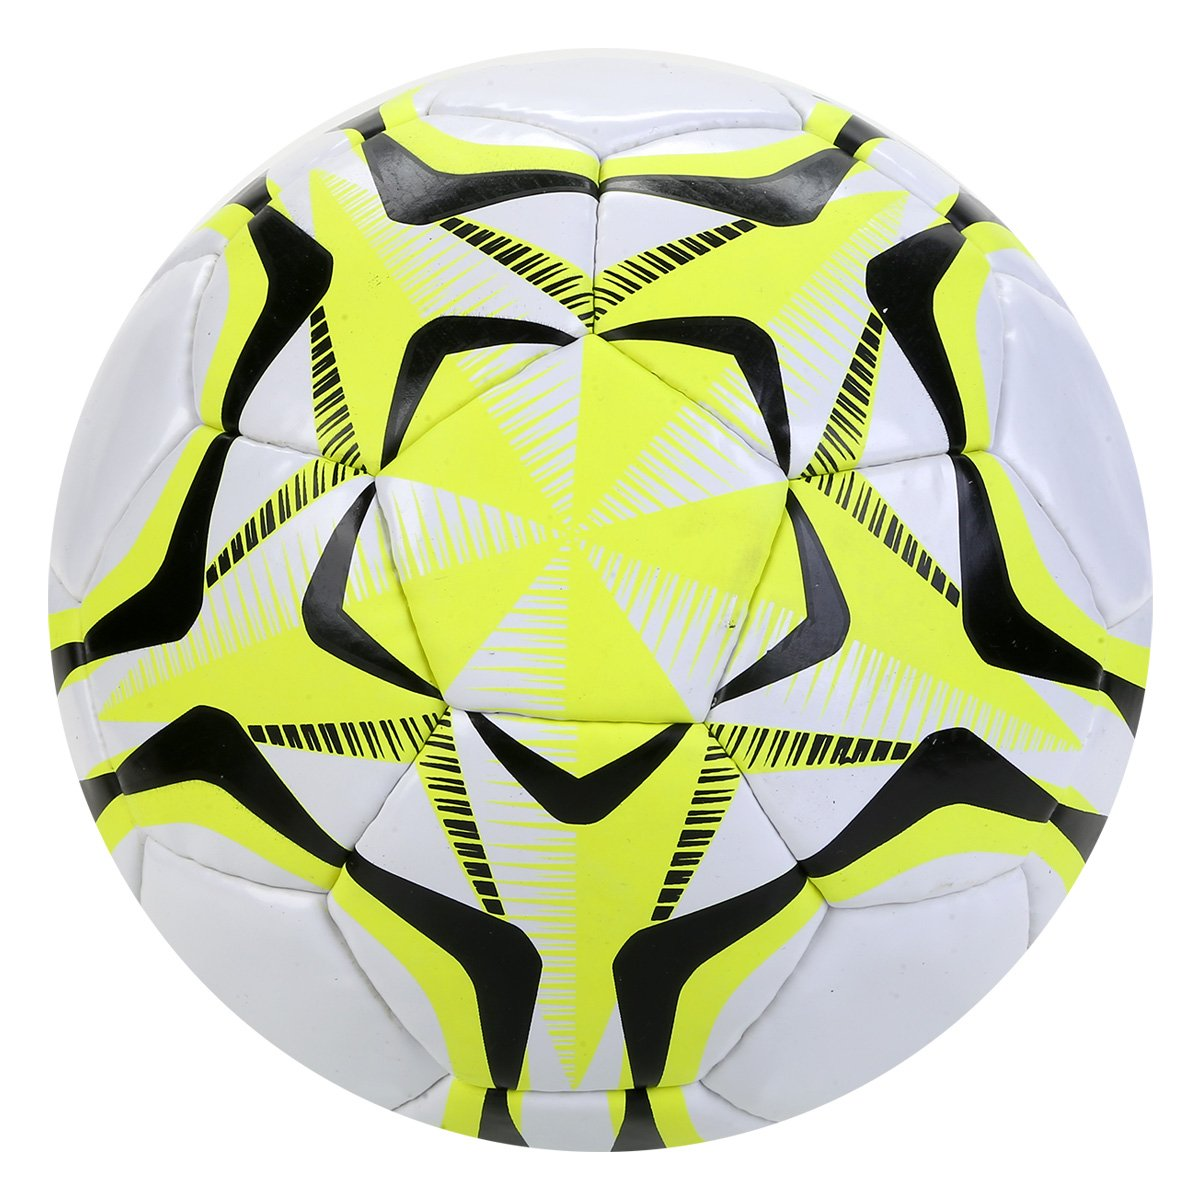 Bola de Futebol Campo Penalty Brasil 70 R2 LX - Branco e Amarelo ... 67be03cfe1ac0